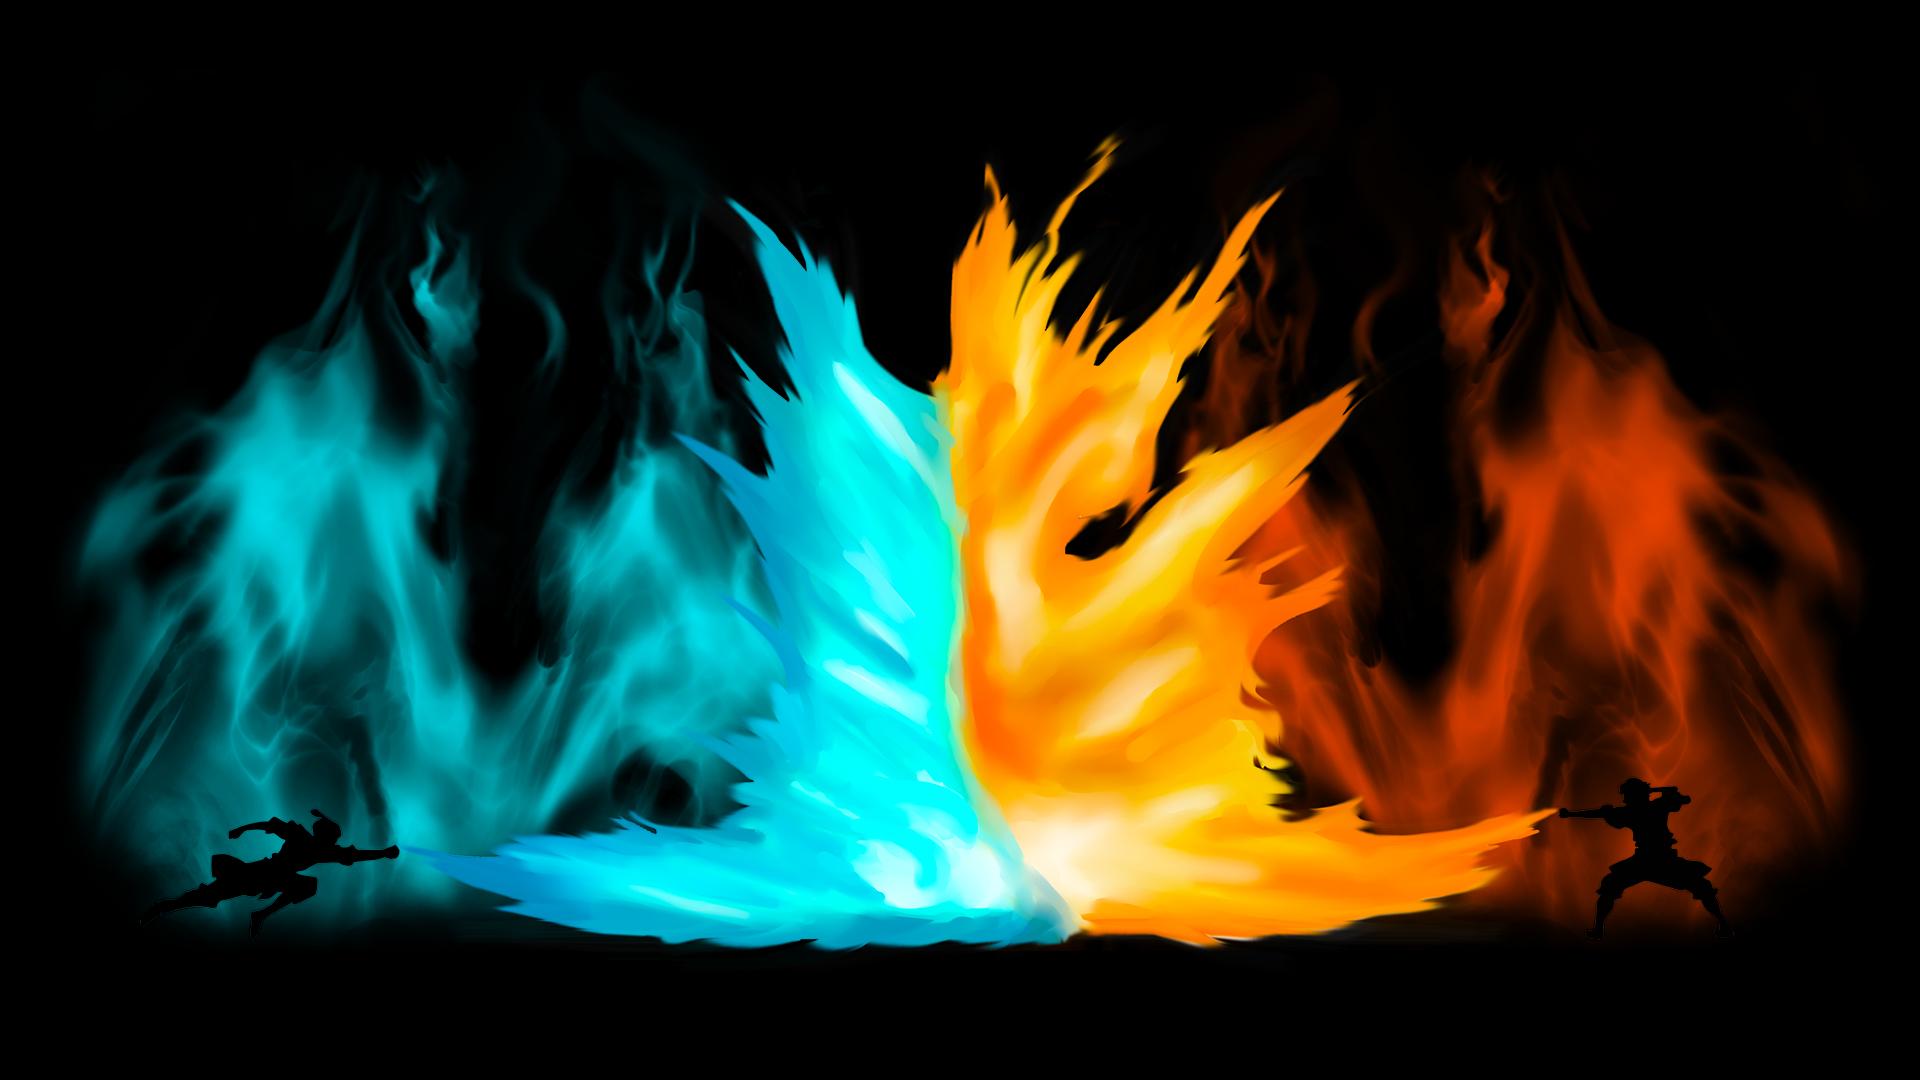 Avatar Agni Kai Zuko Vs Azula Shirt Wallpaper By Sonicthehedgehogbg On Deviantart